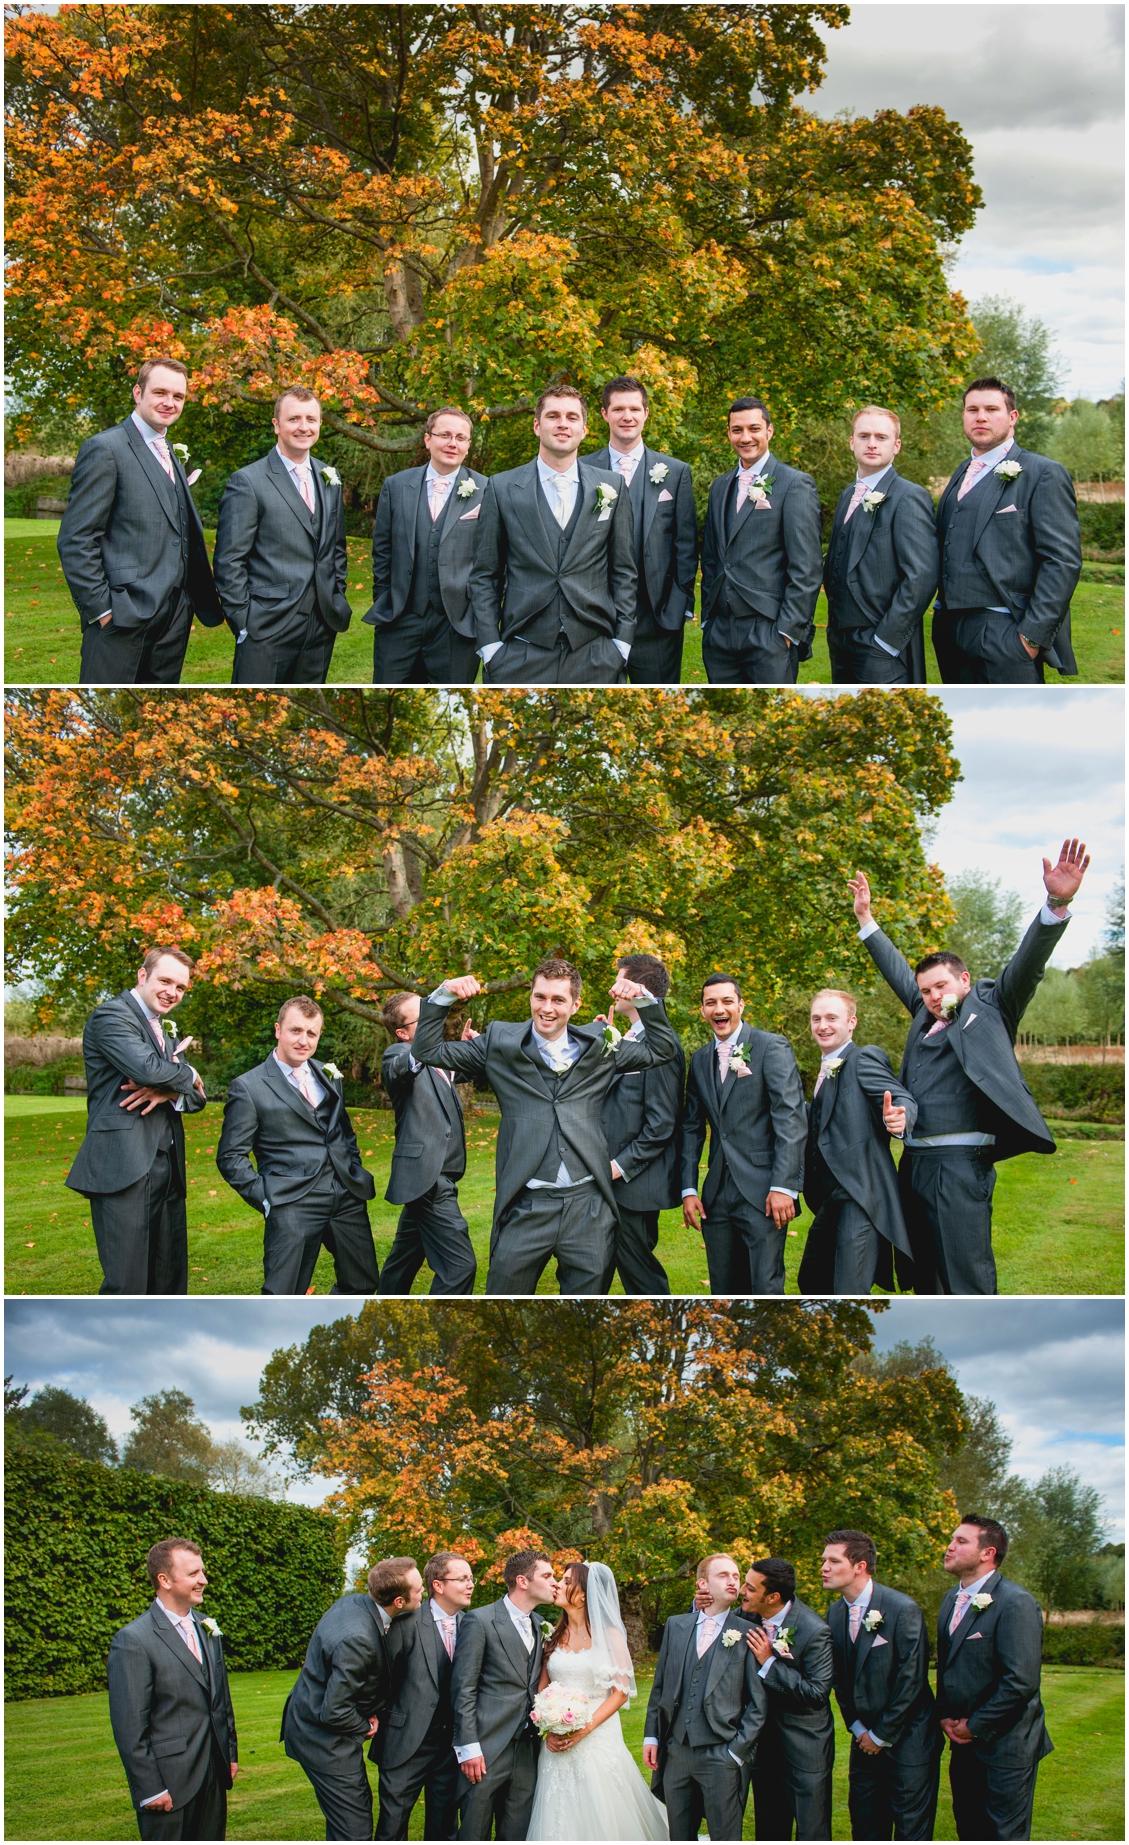 Notley Abbey, groomsmen, ushers, Wedding Photography, Lisa Carpenter Photography, photos, Oxfordshire, West Midlands